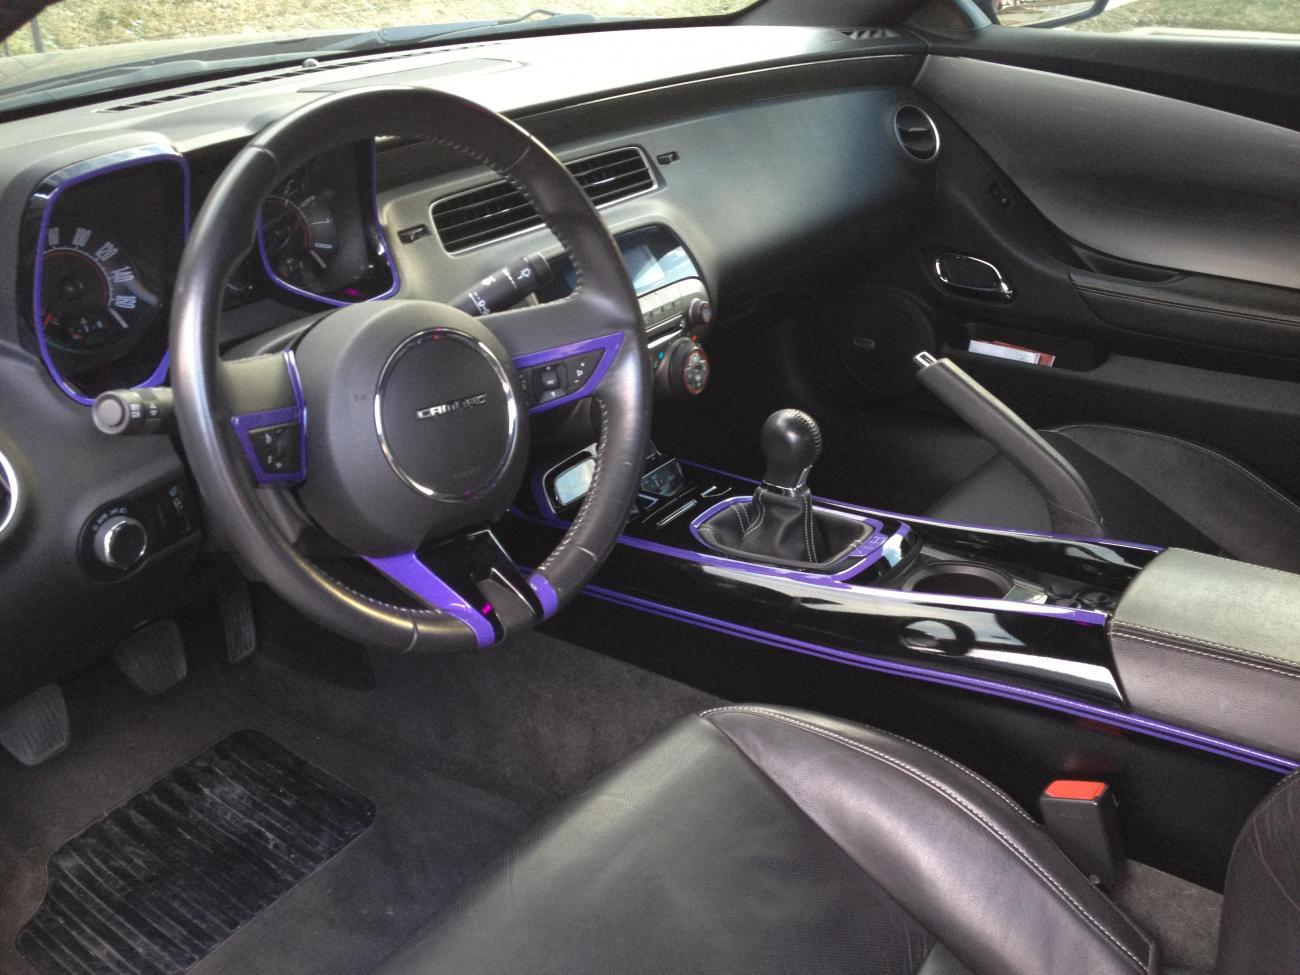 interior mods camaro5 chevy camaro forum camaro zl1. Black Bedroom Furniture Sets. Home Design Ideas